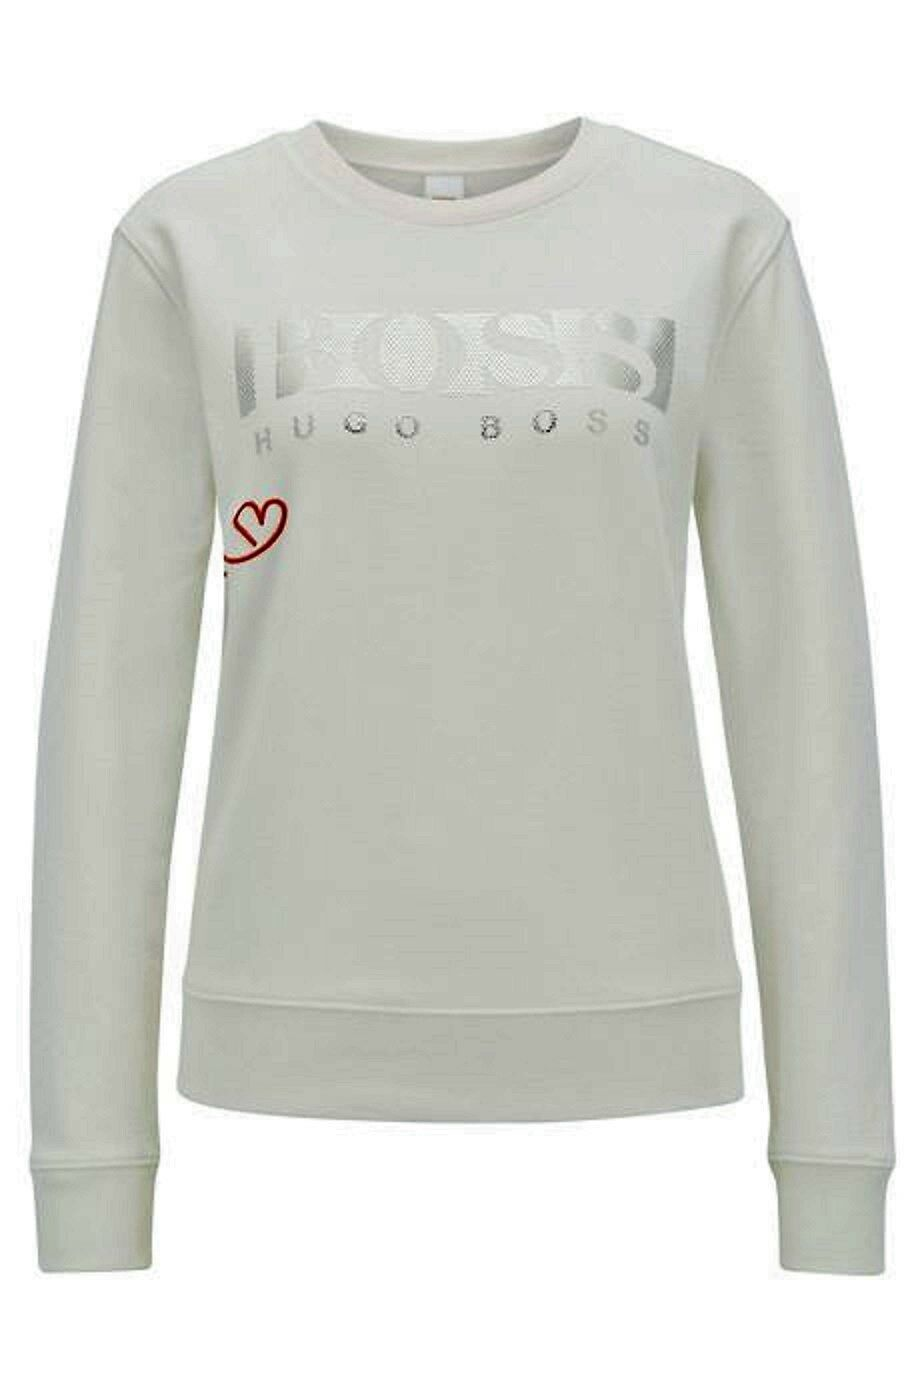 HUGO BOSS Sweatshirt in french terry logo three-dimensional Tacasual 50396083